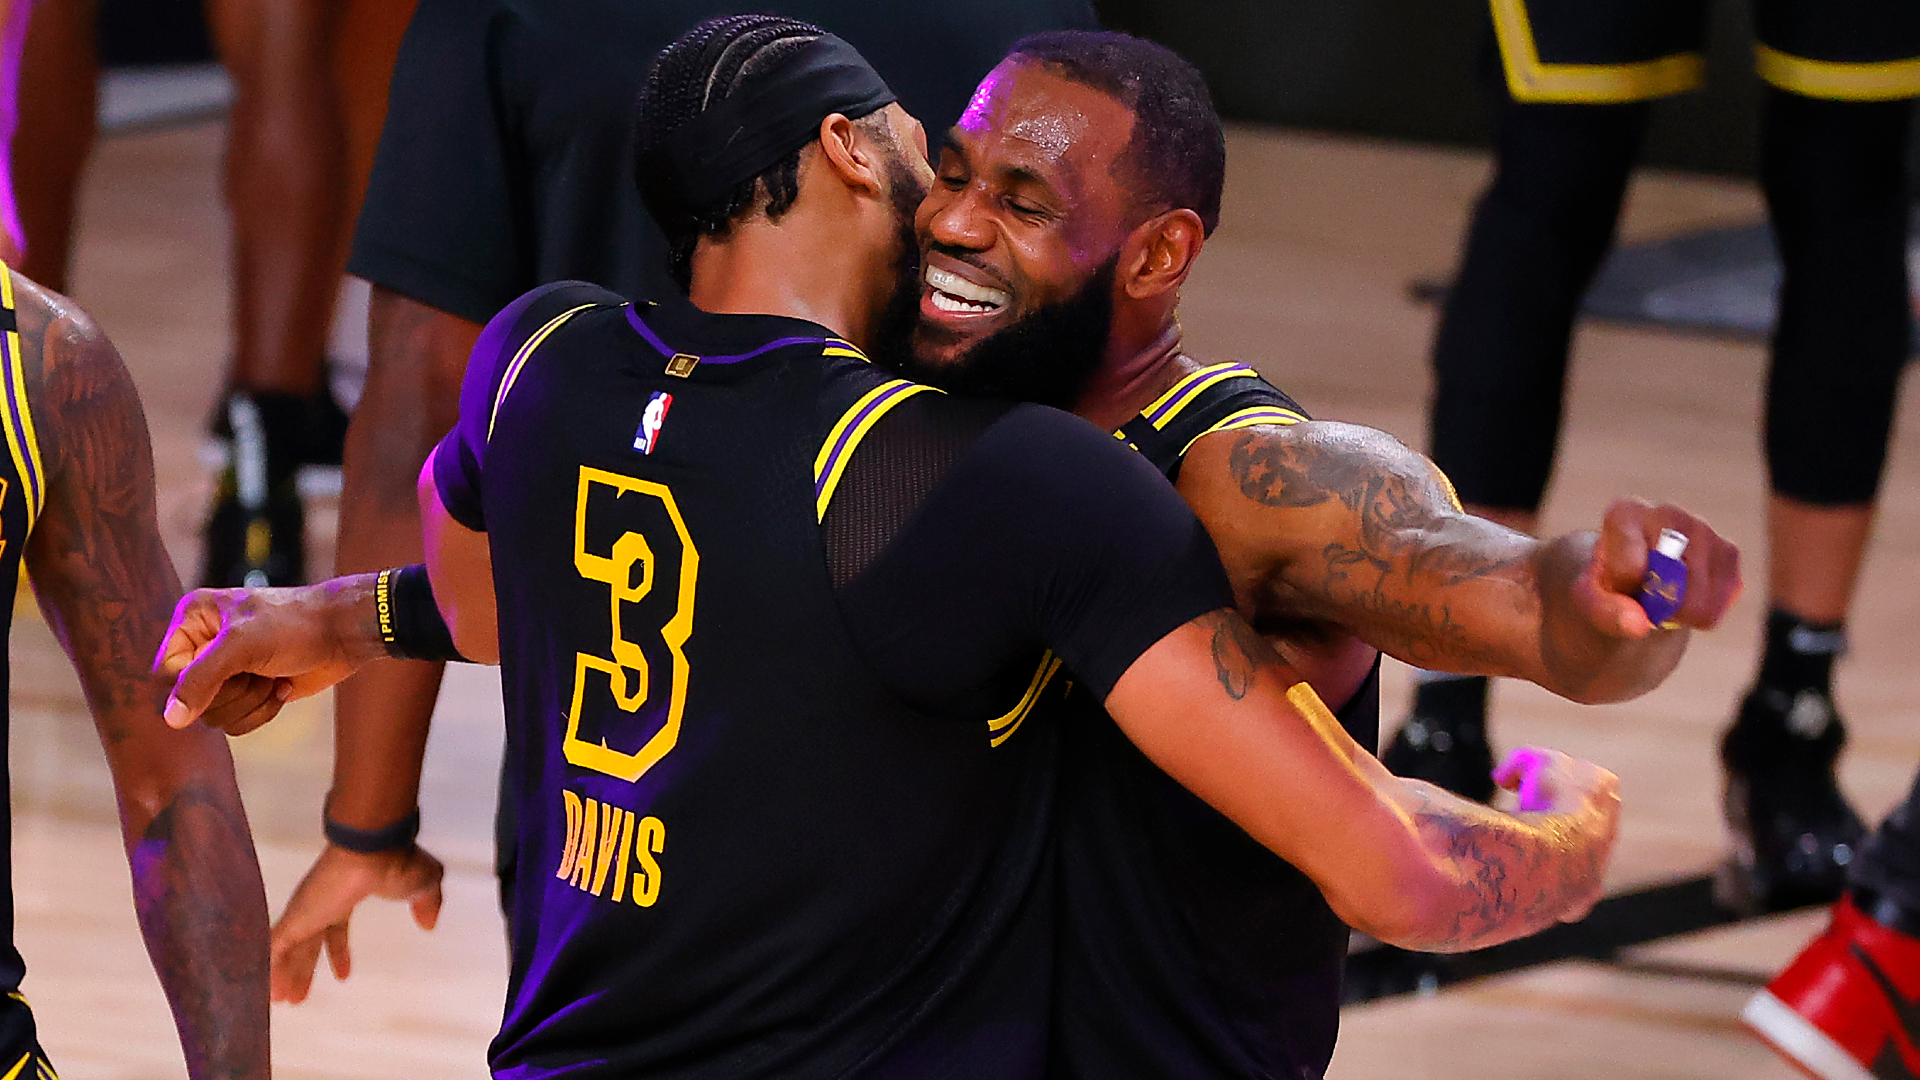 LeBron praises Davis' belief after Lakers star delivers game-winner